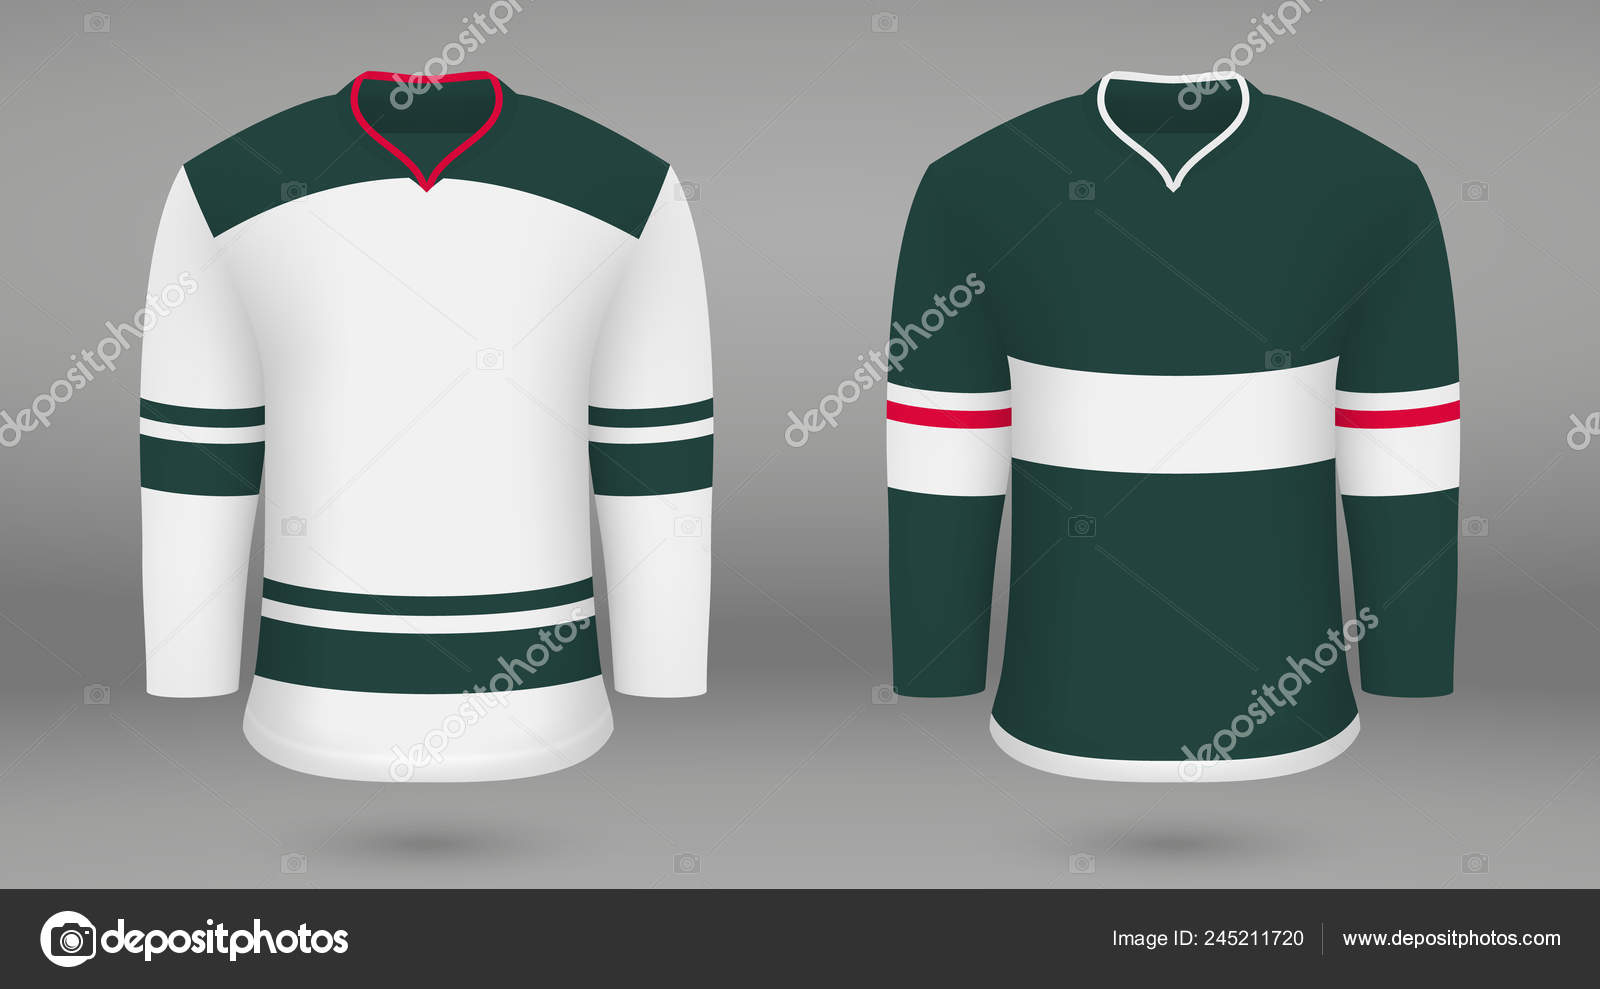 reputable site 70a54 884c7 Pictures: minnesota wild hockey   Realistic Hockey Kit Shirt ...